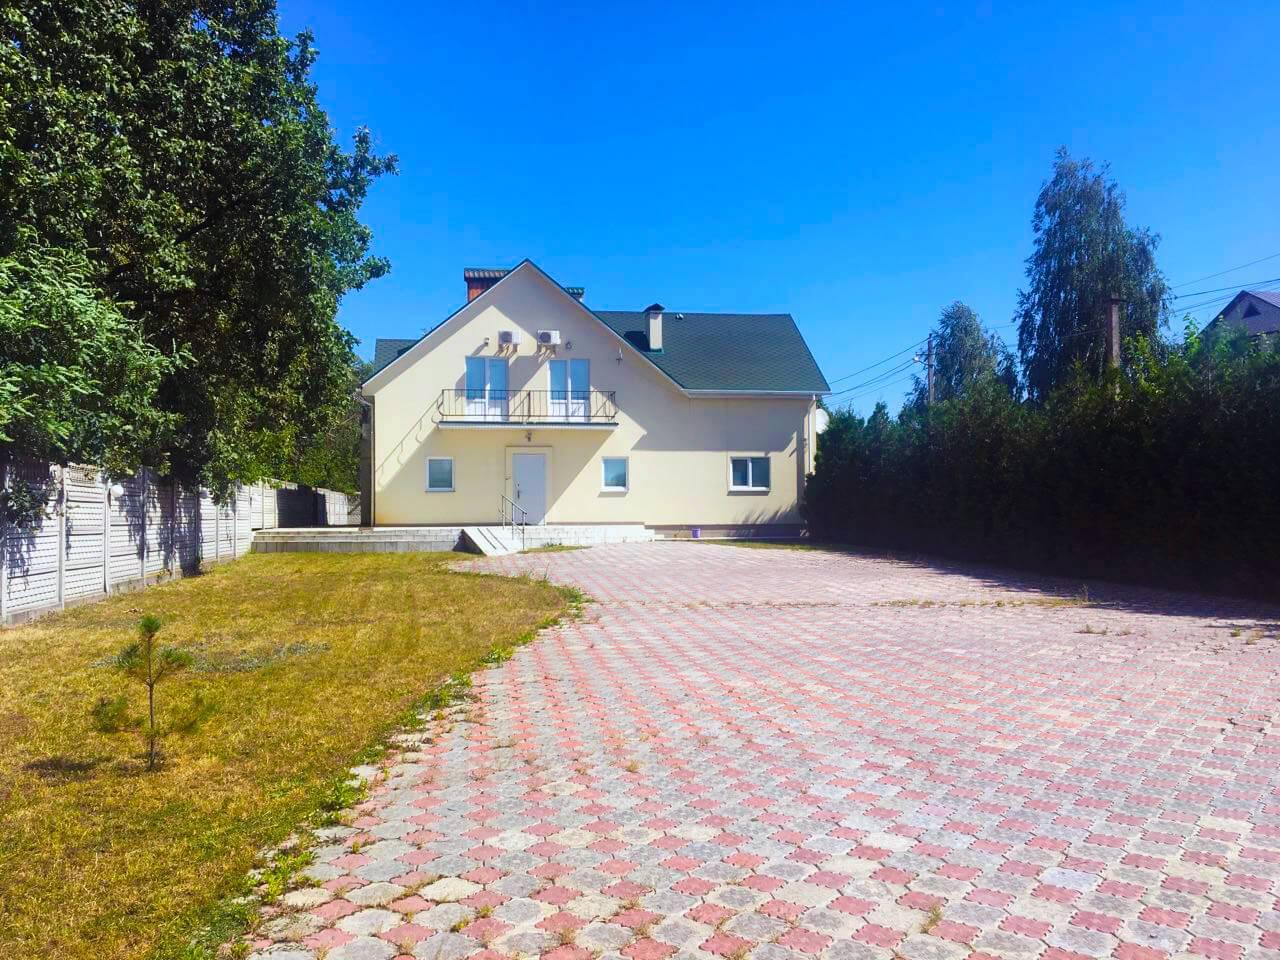 Частные дома престарелых в чернигове дом престарелых каменка